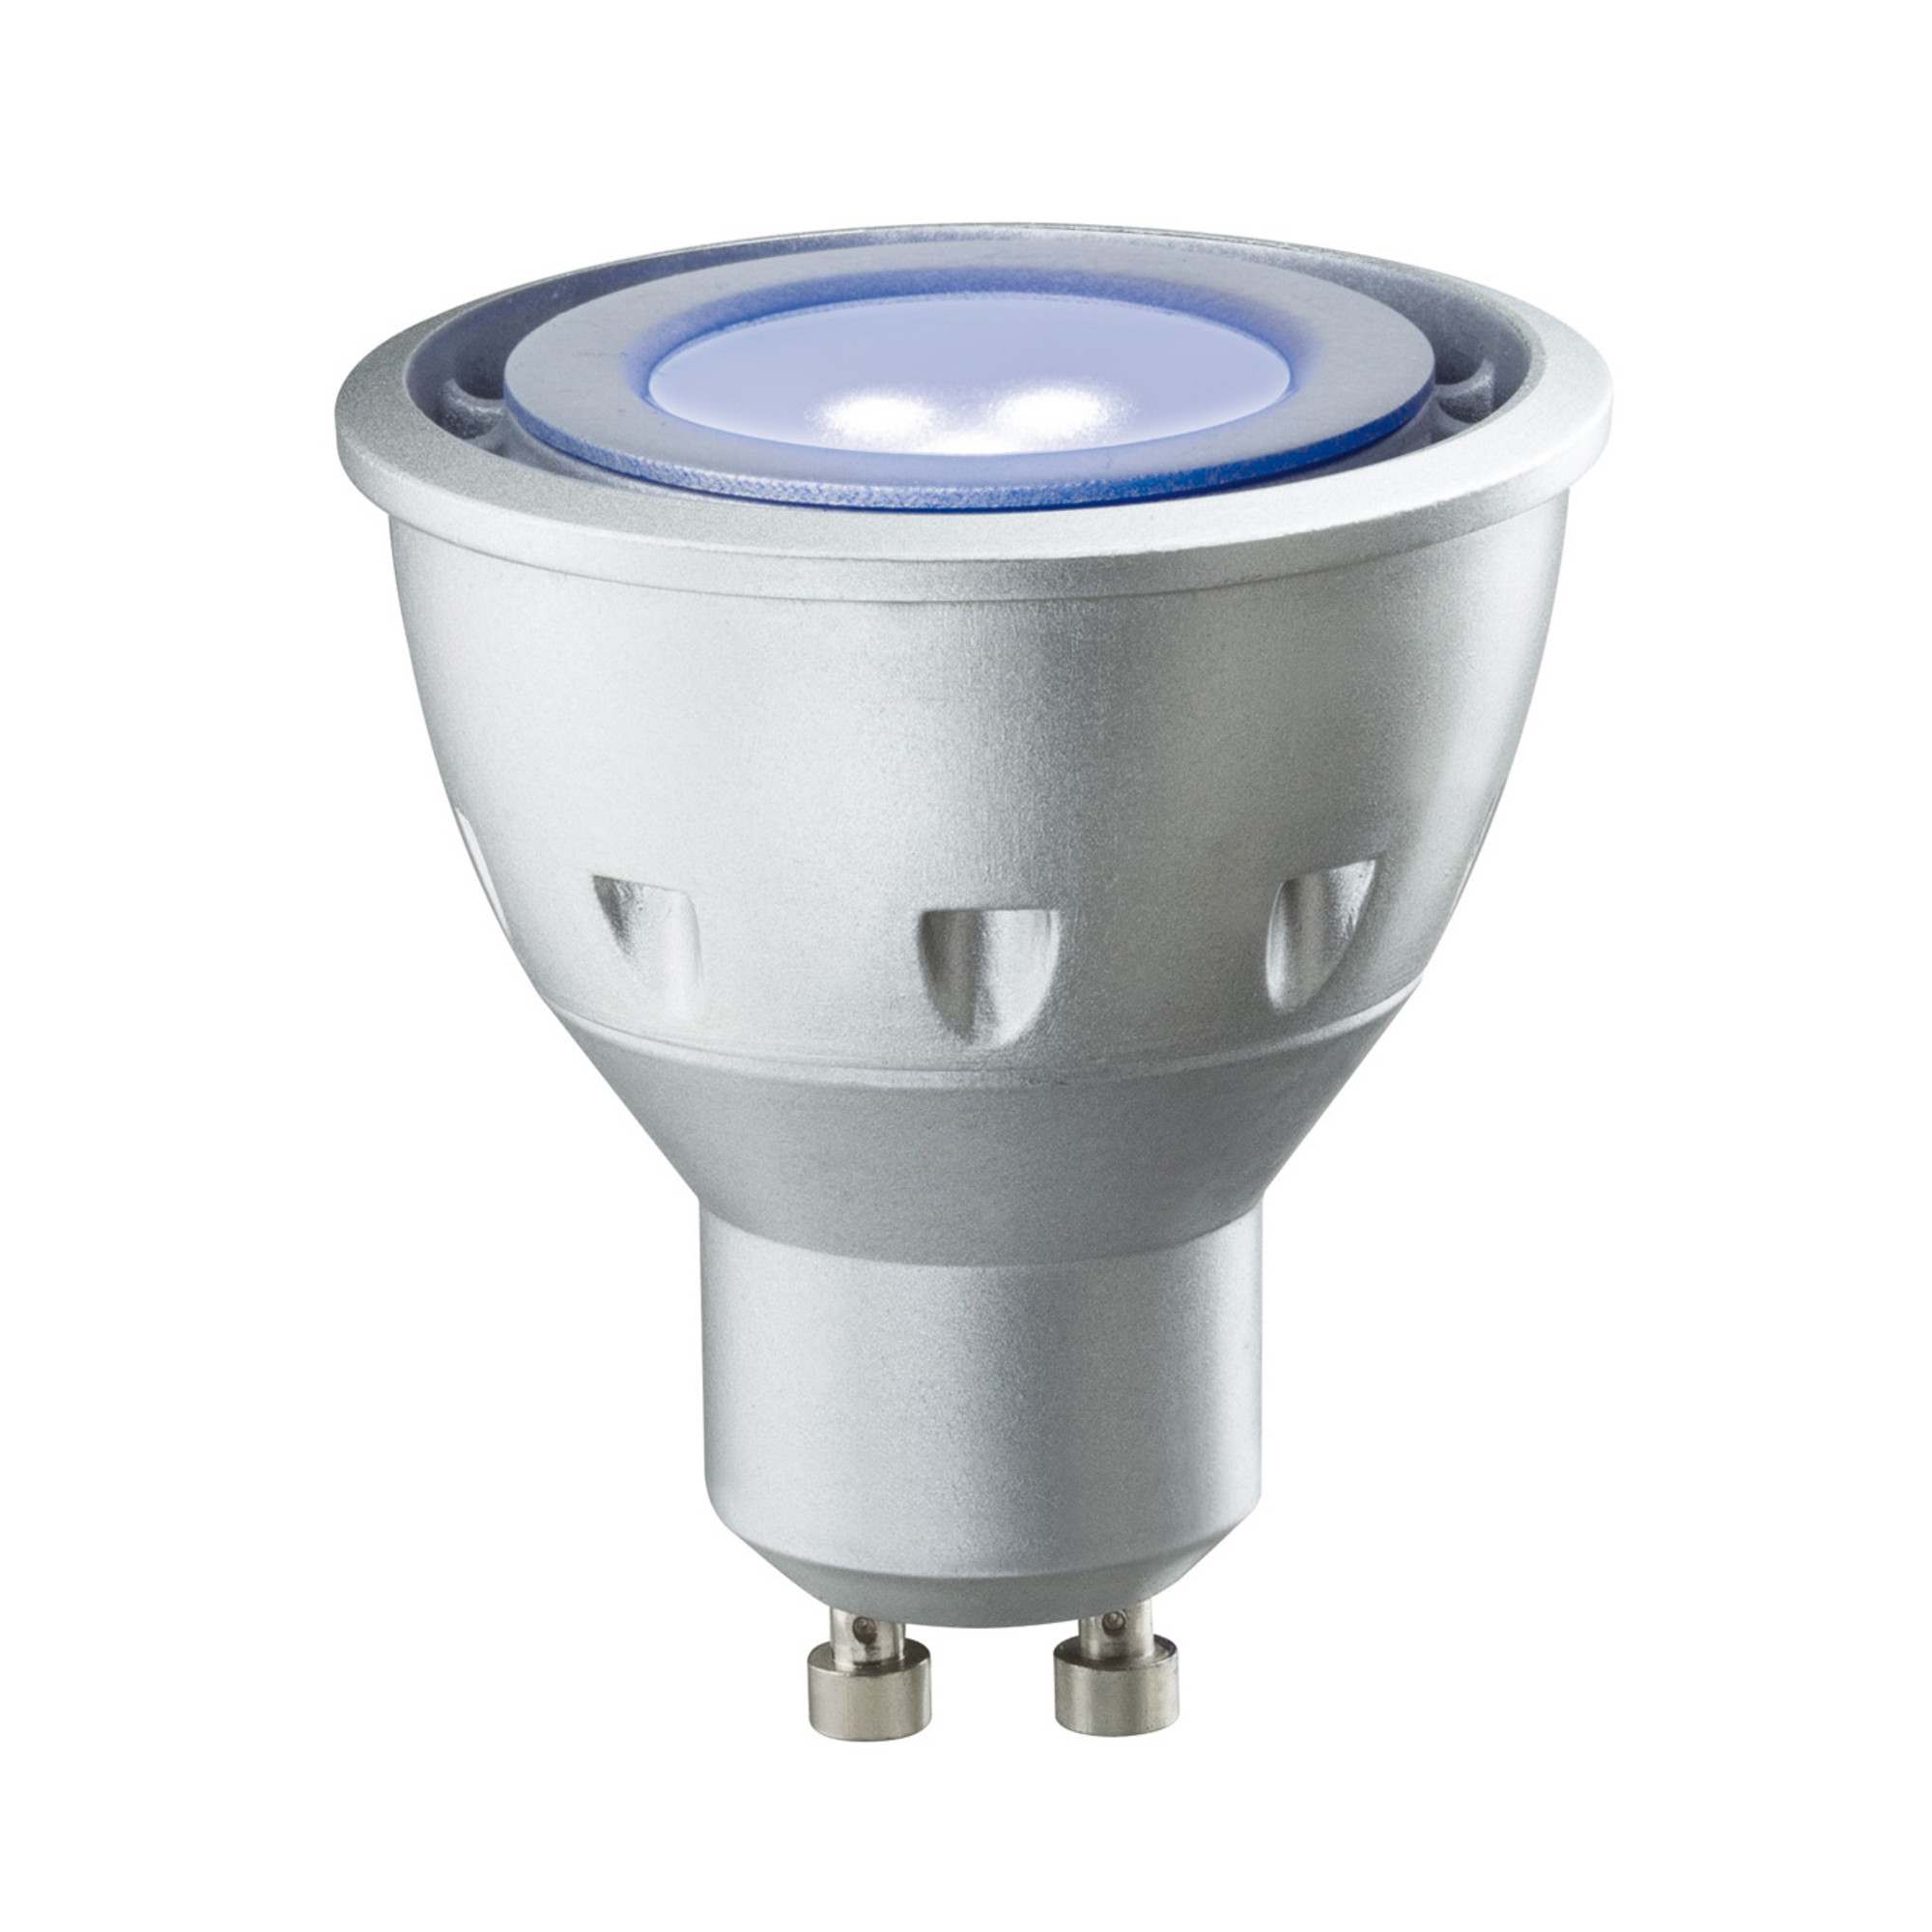 Лампа светодиодная Paulmann 28216 GU10 1 Лм теплый свет